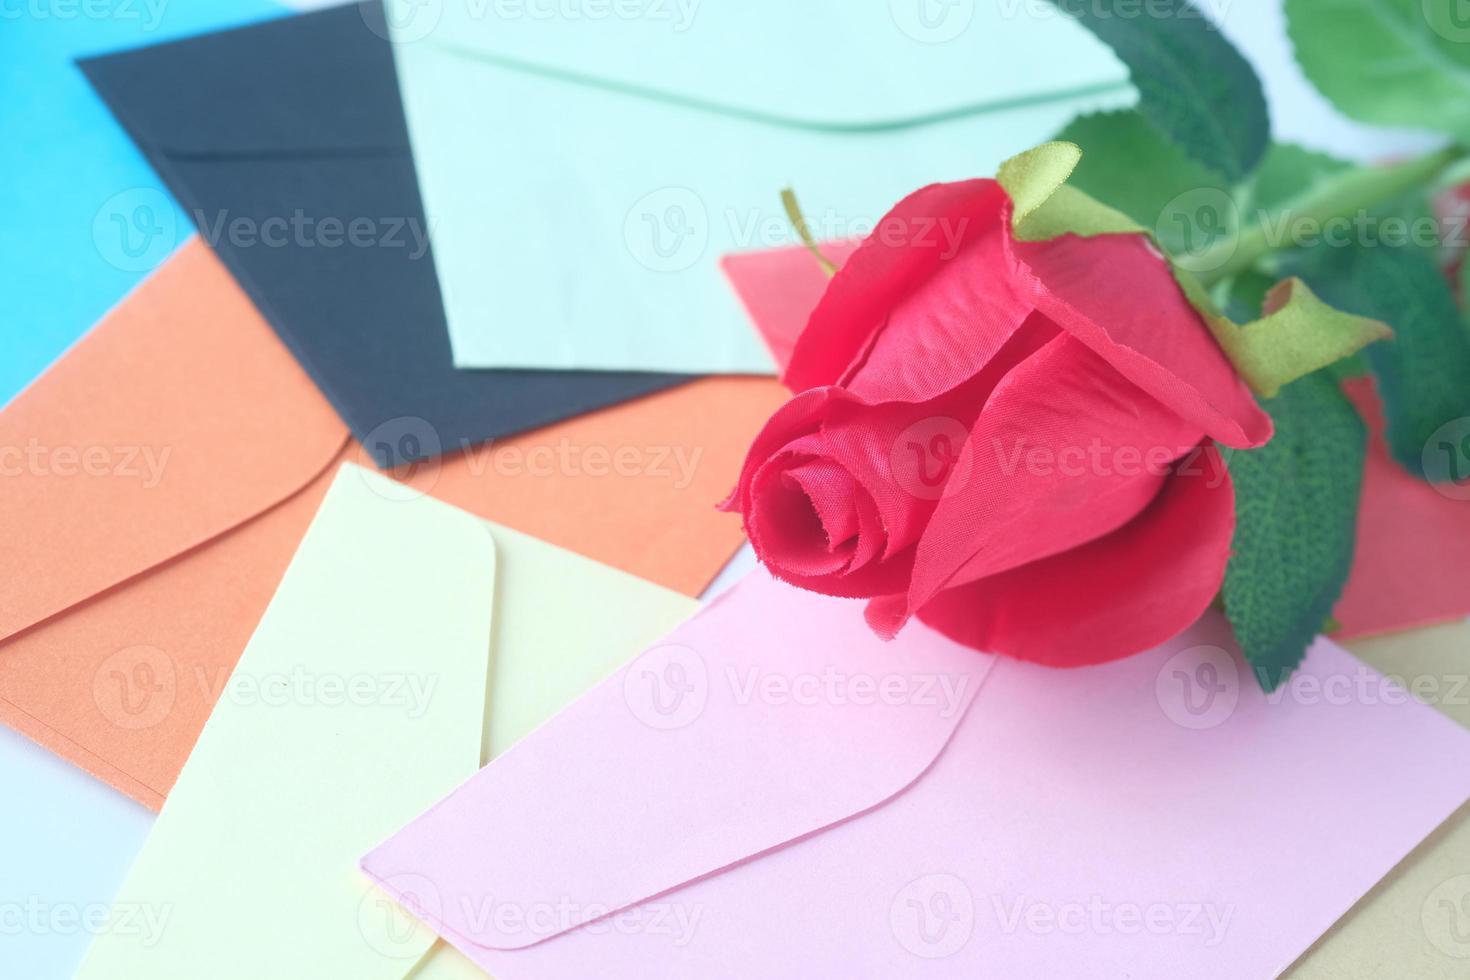 rosa artificial com envelopes coloridos foto